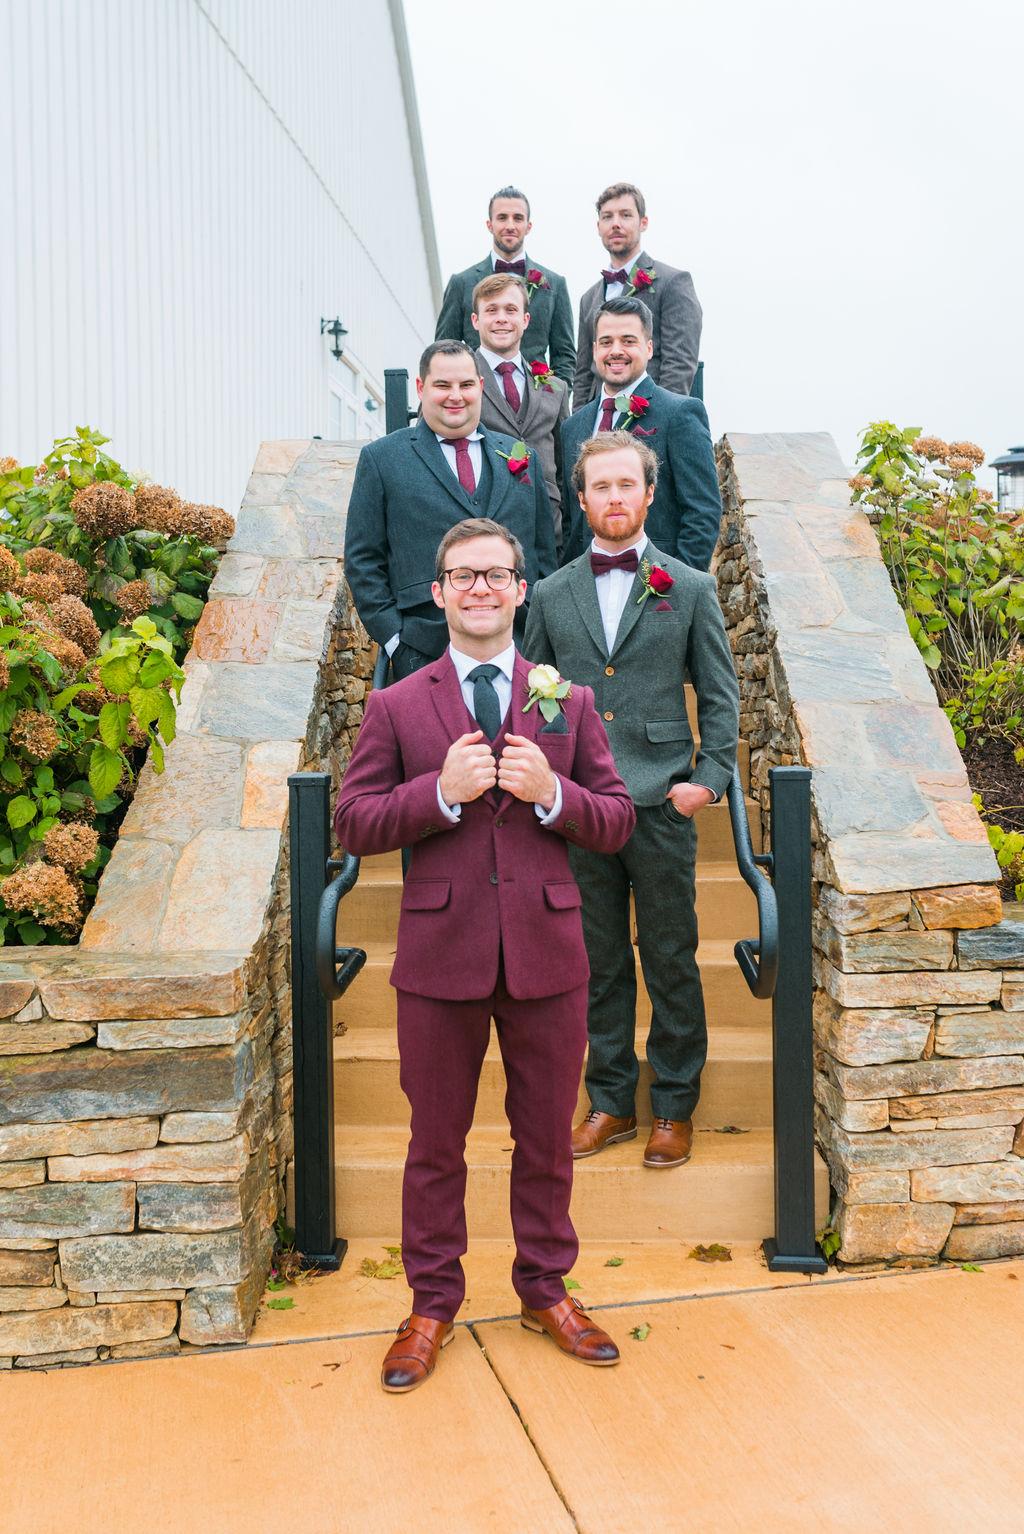 barn-stoneybrooke-JN-pennsylvania-wedding-photographer-243.jpg